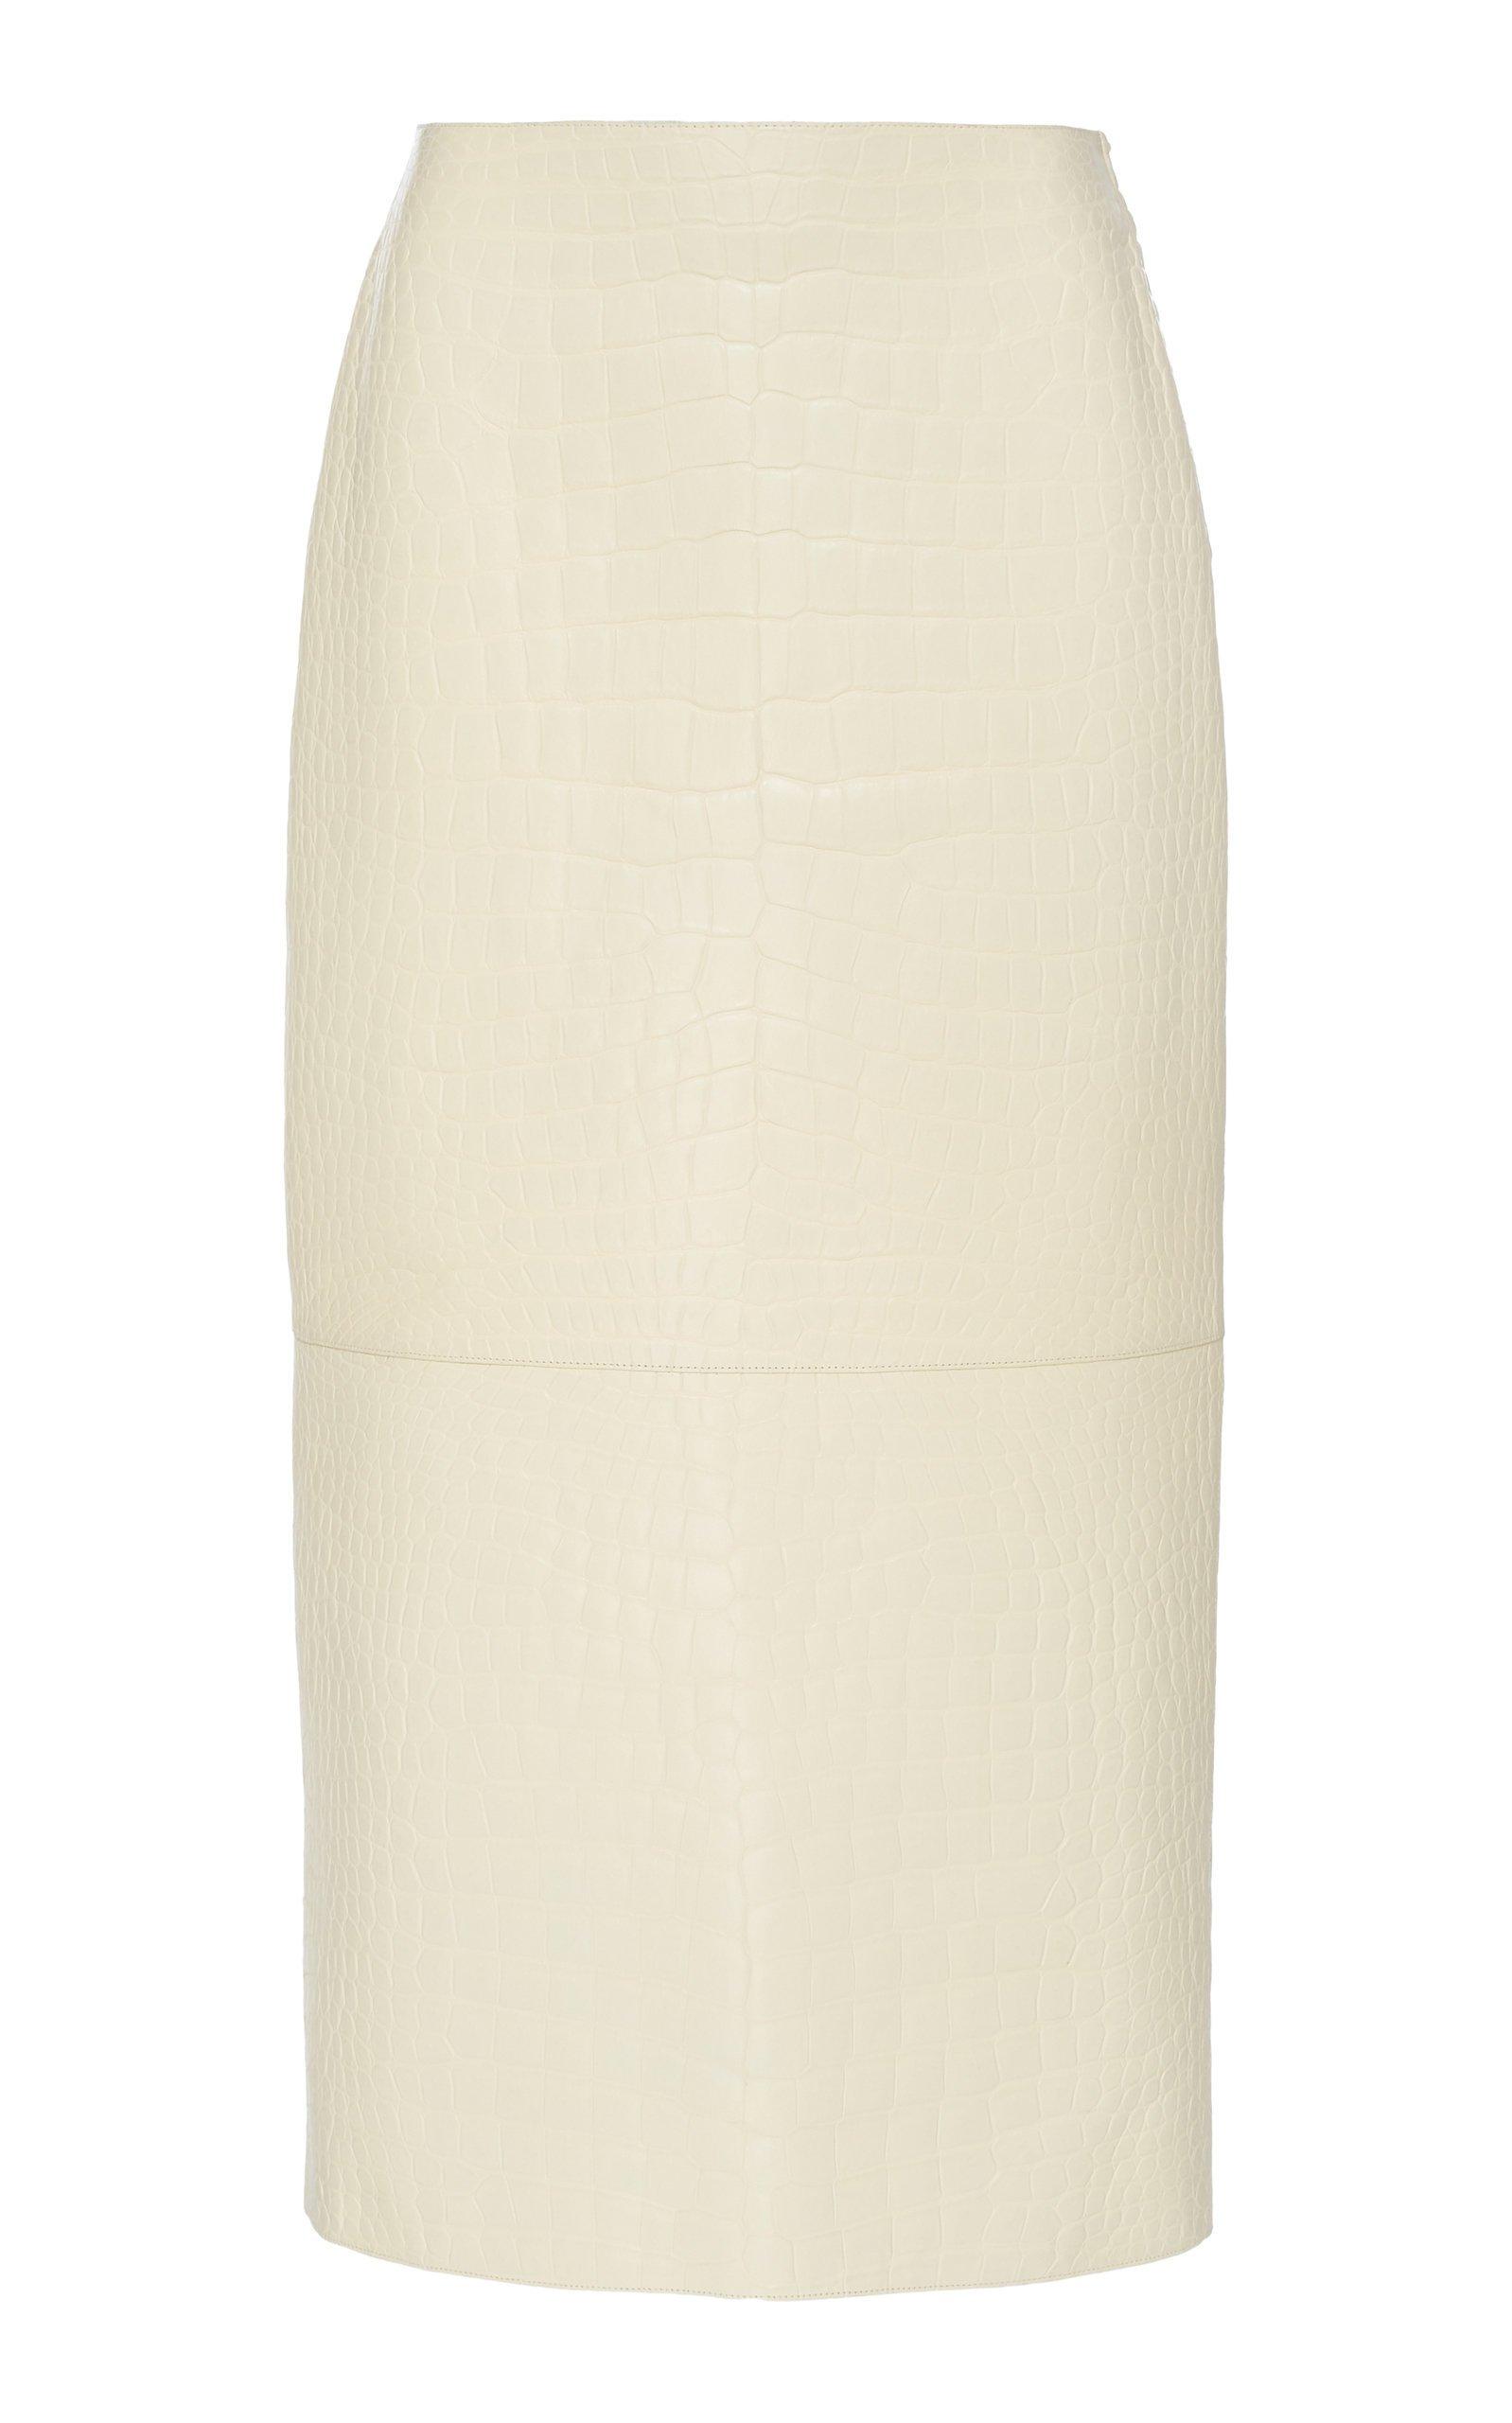 The Row Jenna Crocodile Midi Skirt Size: 4